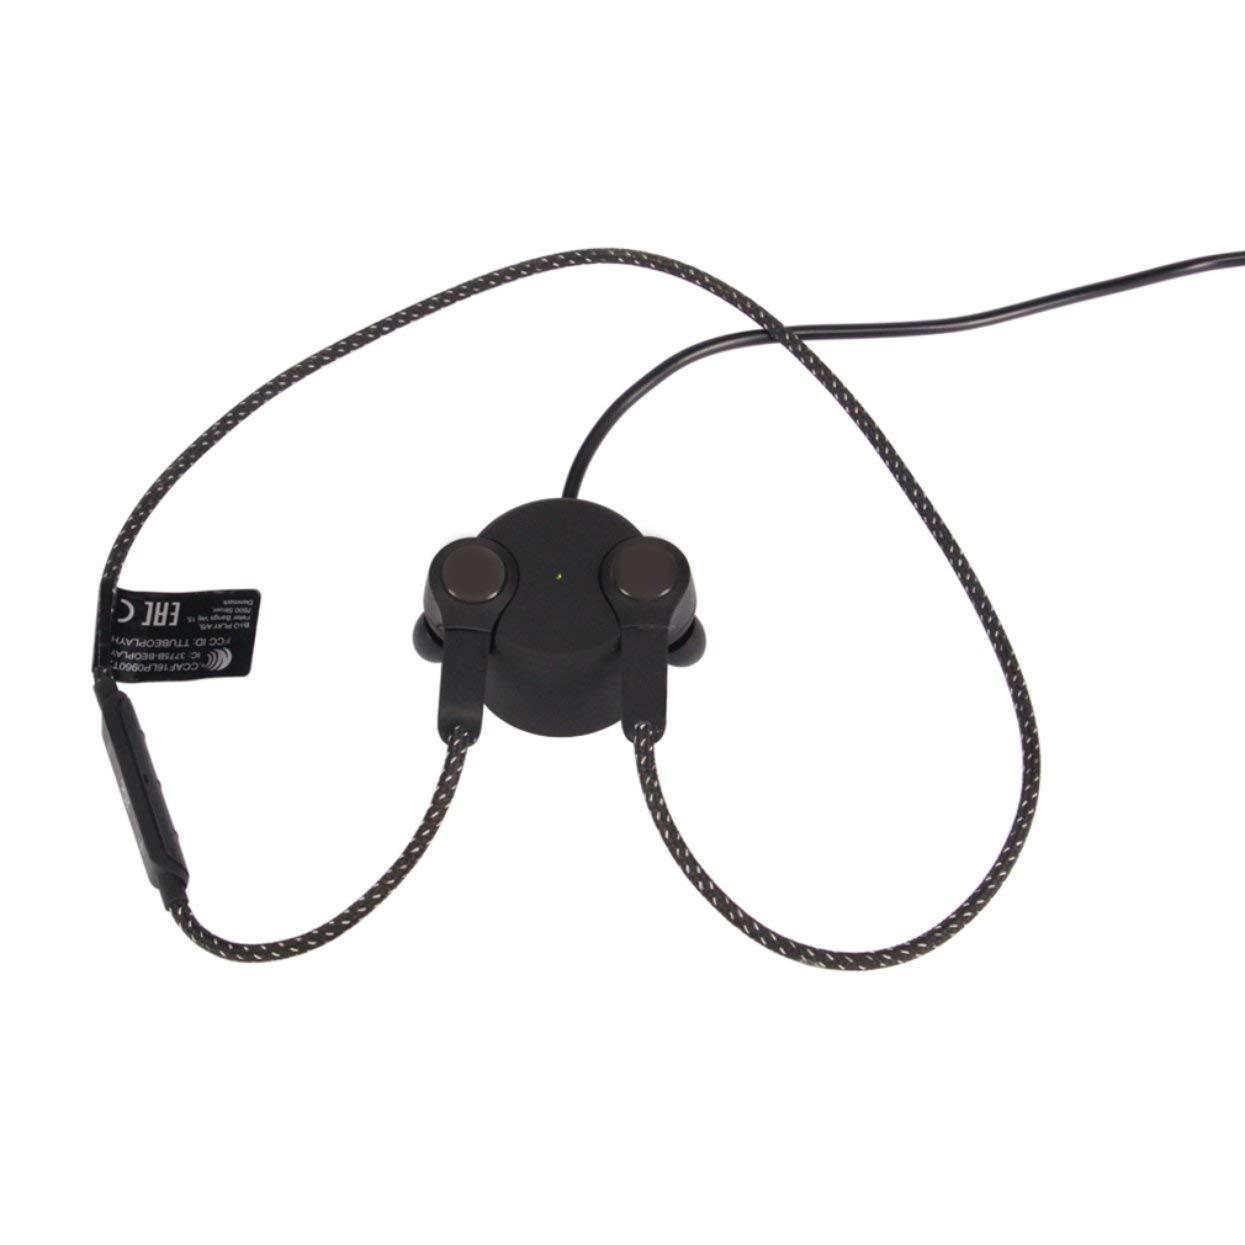 Tree-on-Life Reemplace la Base de Carga de la Base de Carga del Cargador para B/&O Play by para Bang /& Olufsen para Auriculares inal/ámbricos Bluetooth para Auriculares Beoplay H5